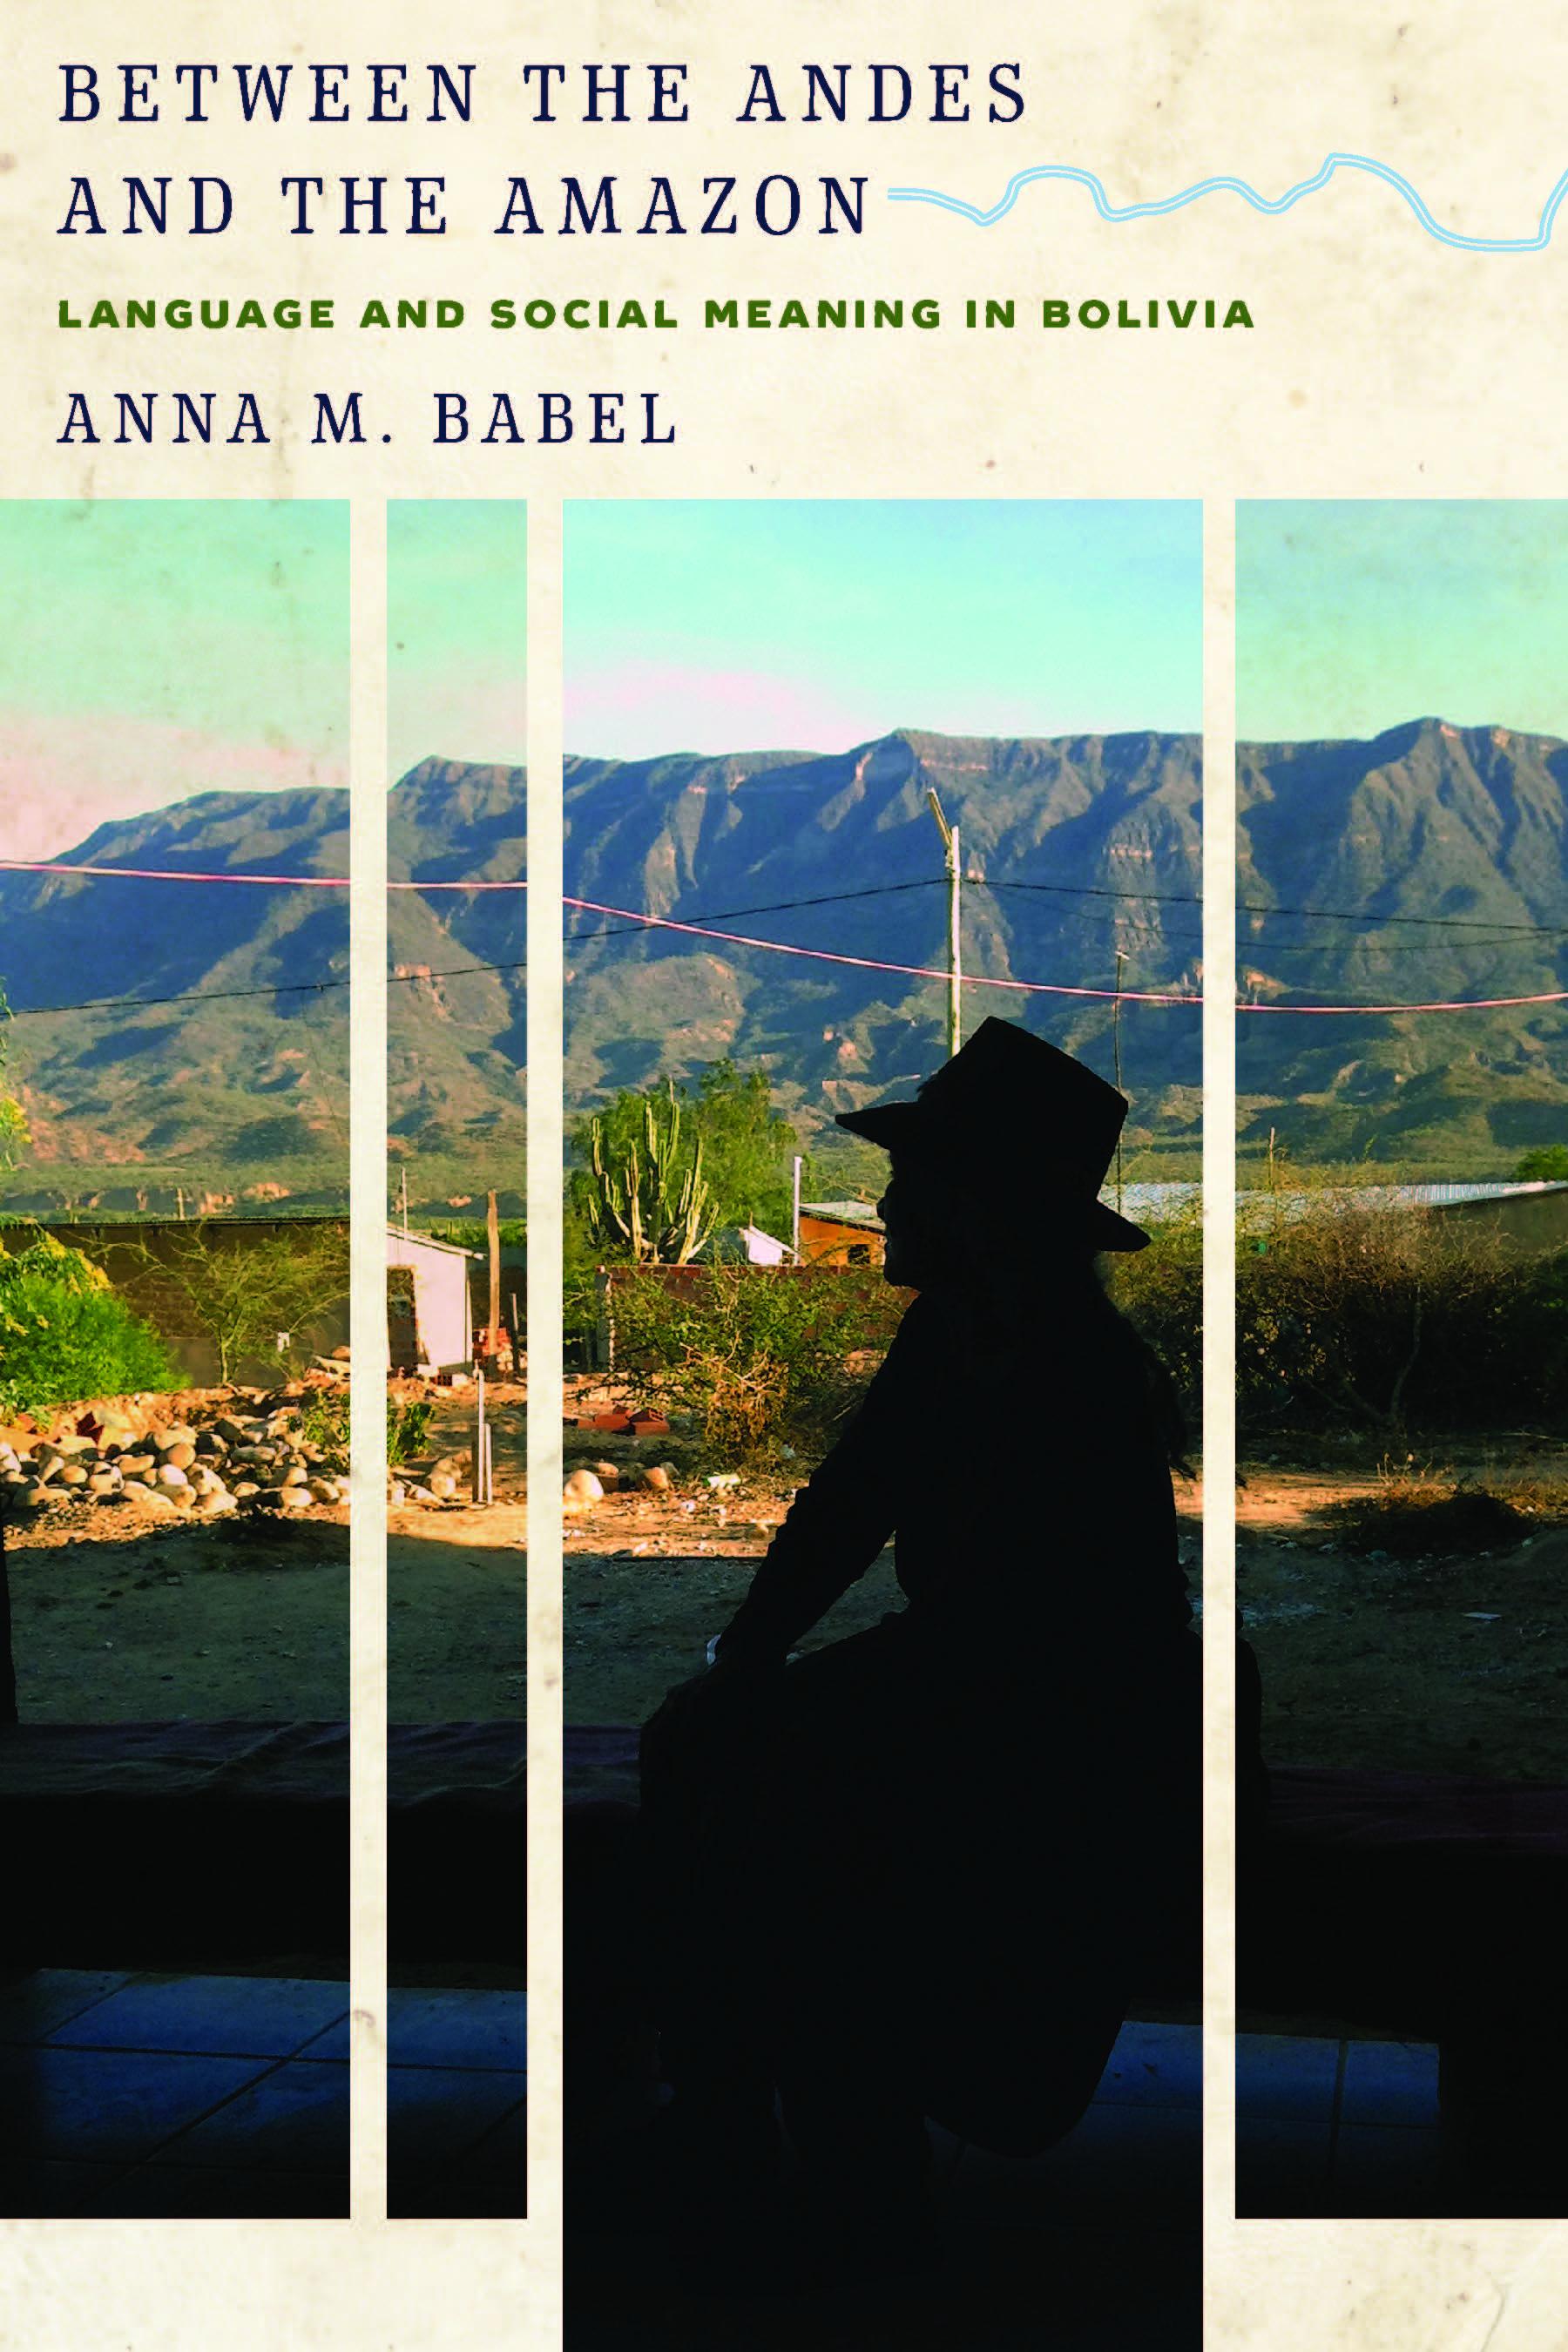 Anna Babel | Department of Linguistics